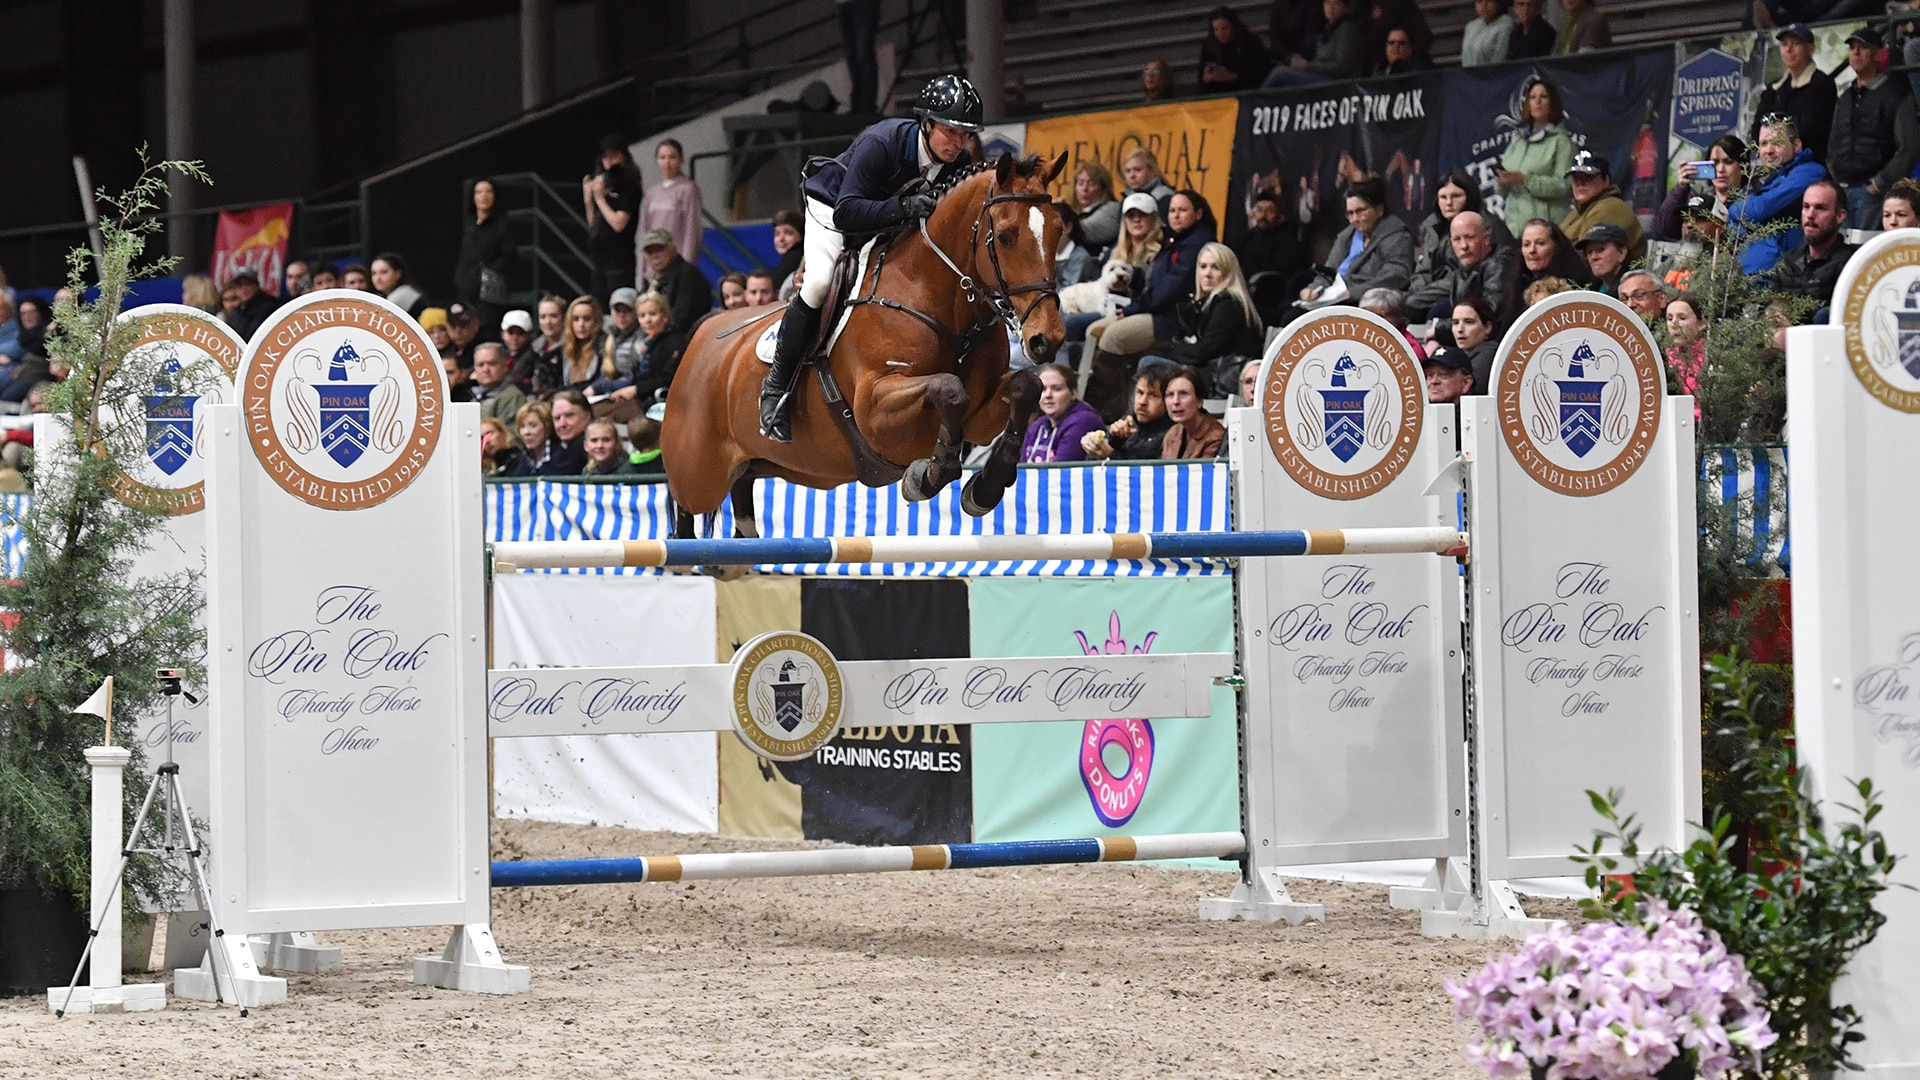 Pin Oak Charity Horse Show 2021, USA